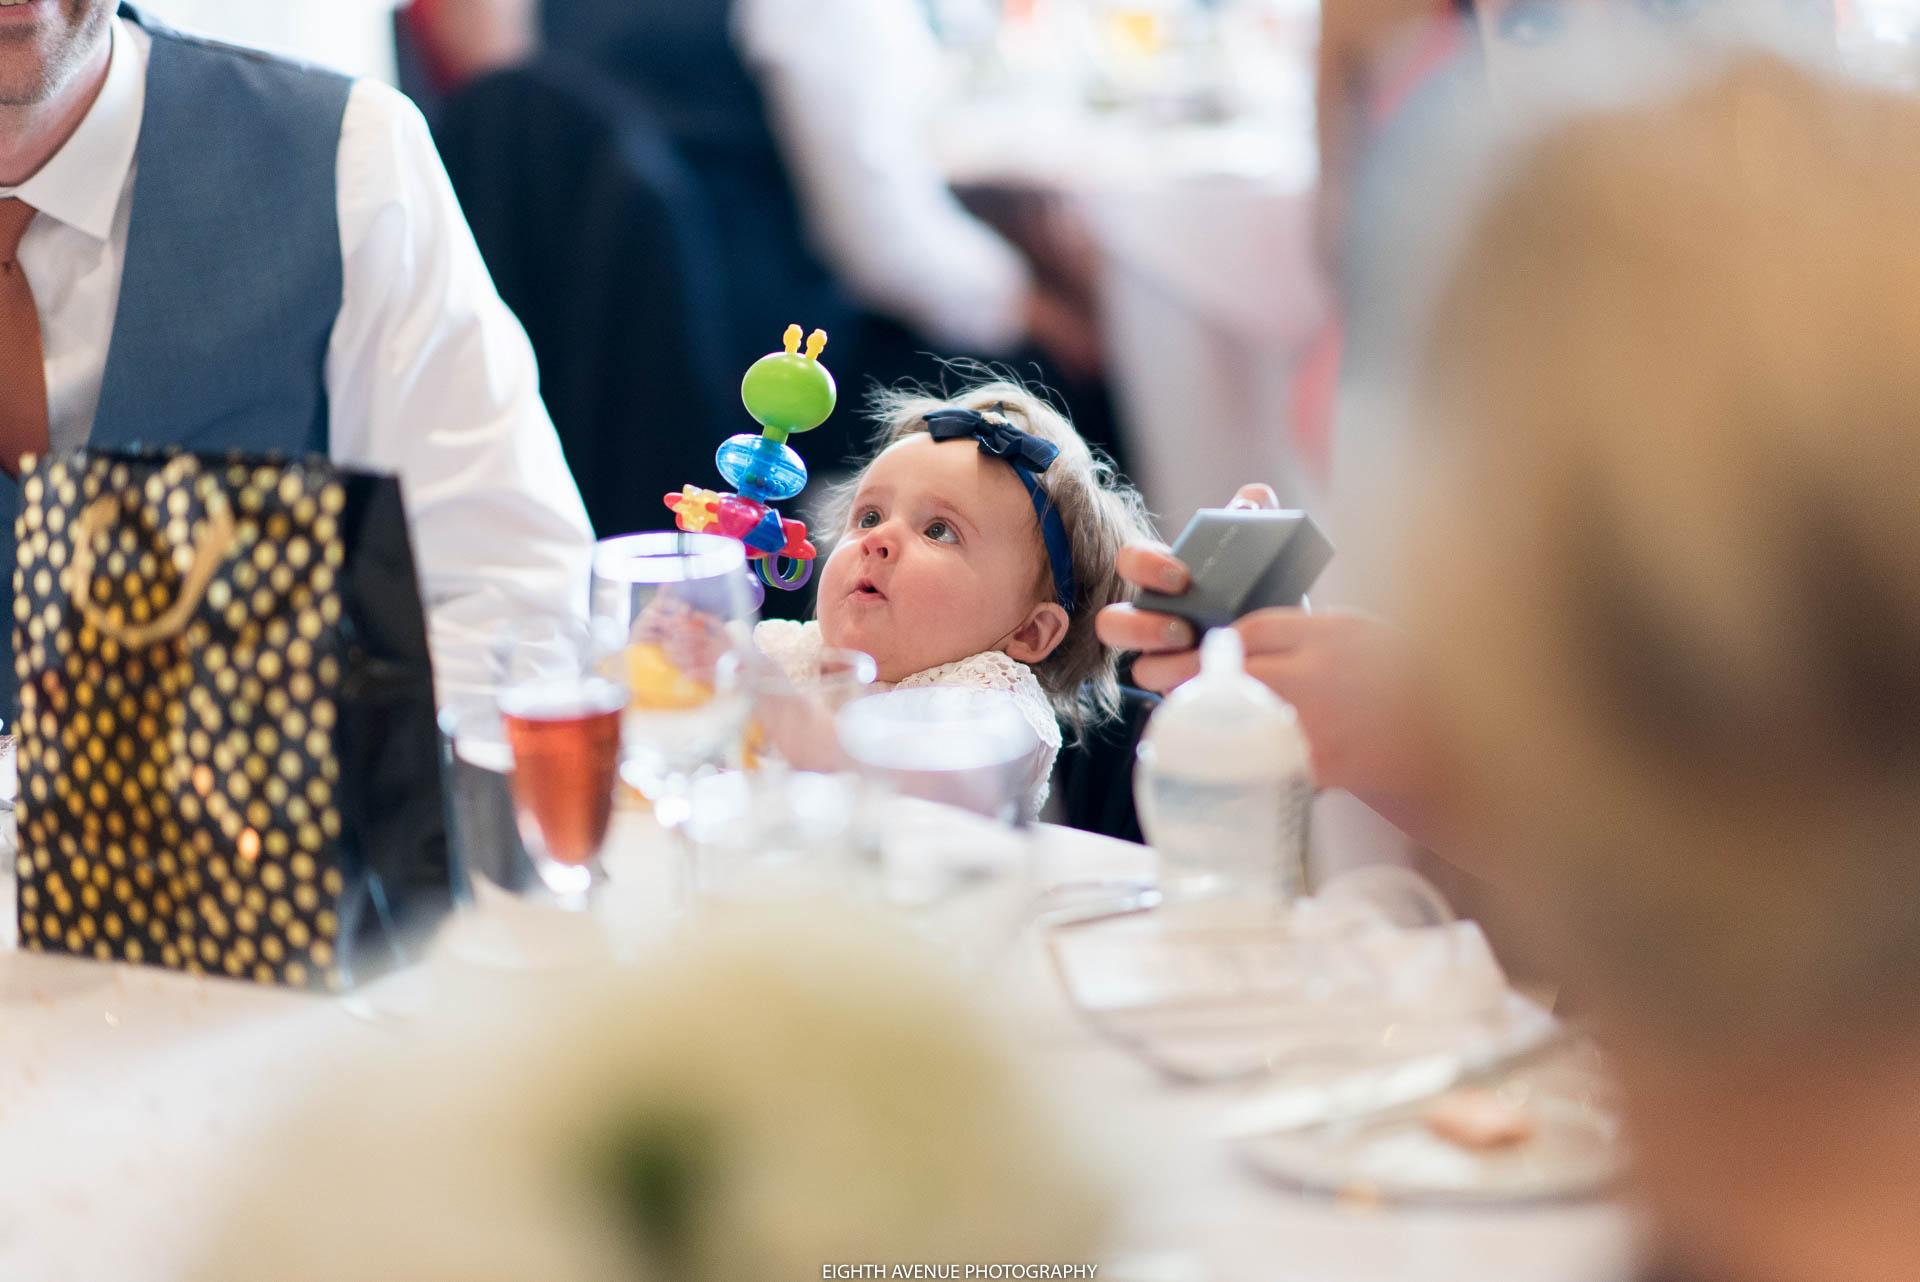 Child looking at toy Beeston manor Wedding